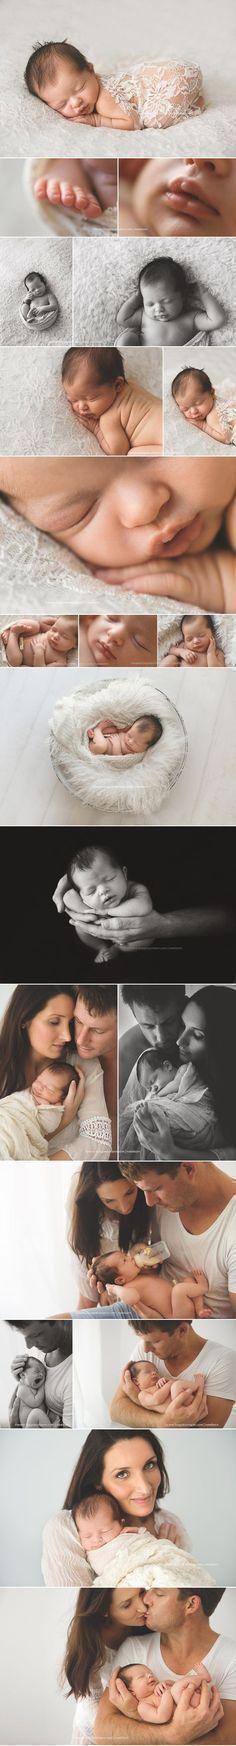 Matilda | Perth Maternity and Newborn Photographer » Perth Baby Photographer Lisa Goessmann Modern Photography Newborn Photography babies and pregnancy #maternityphotography #pregnancyphotography